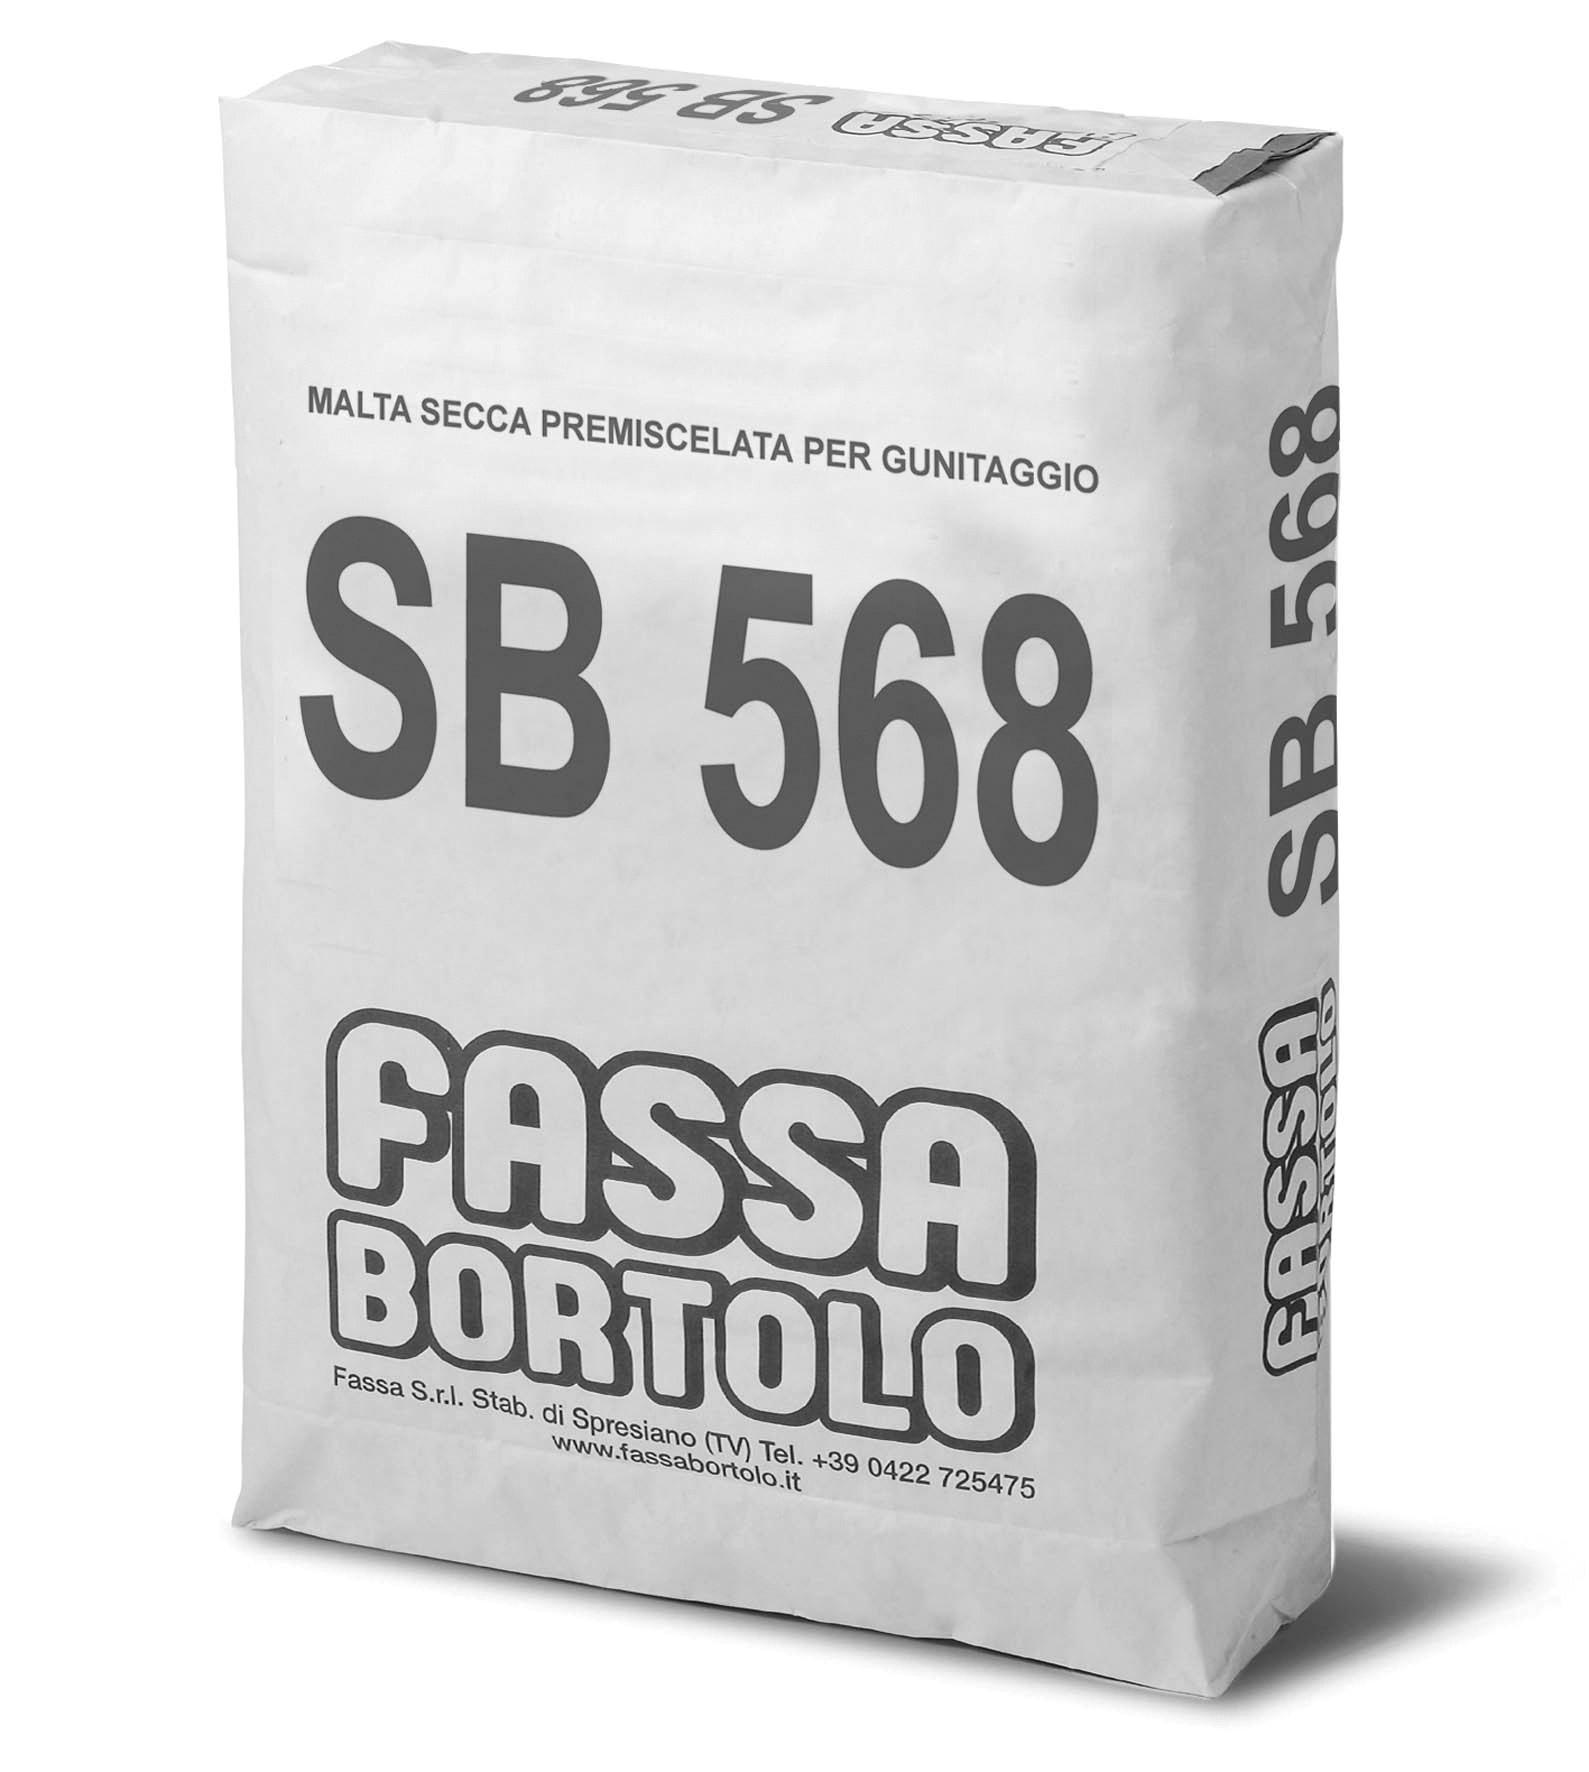 SB 568